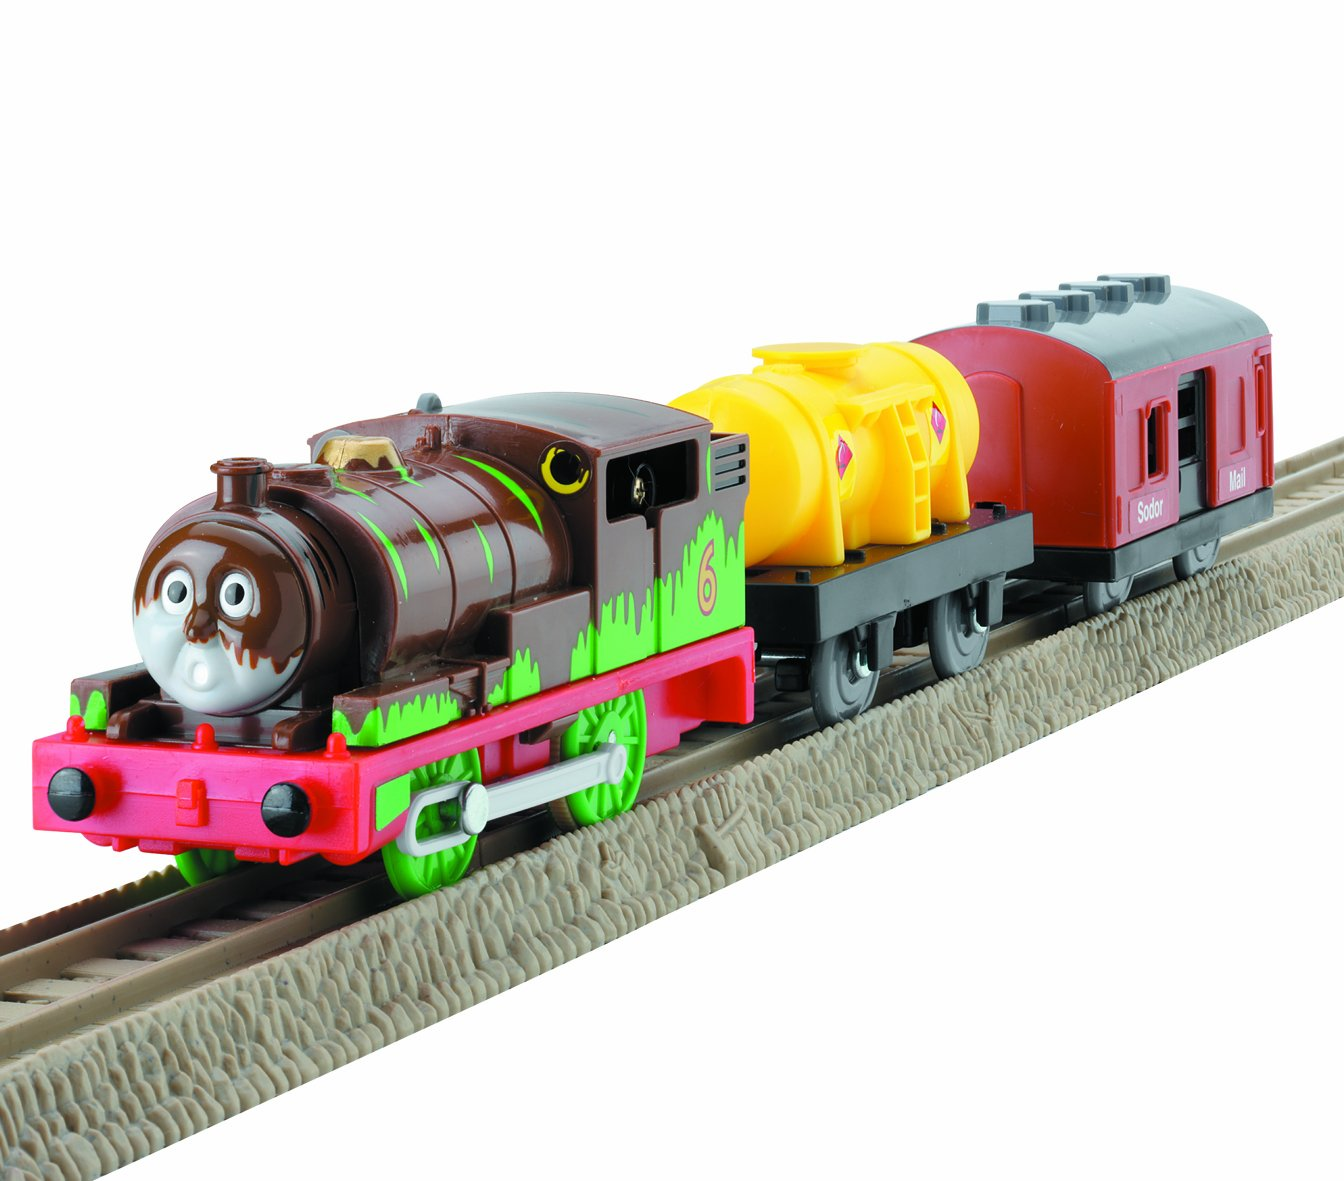 Thomas The Train Cake Colors